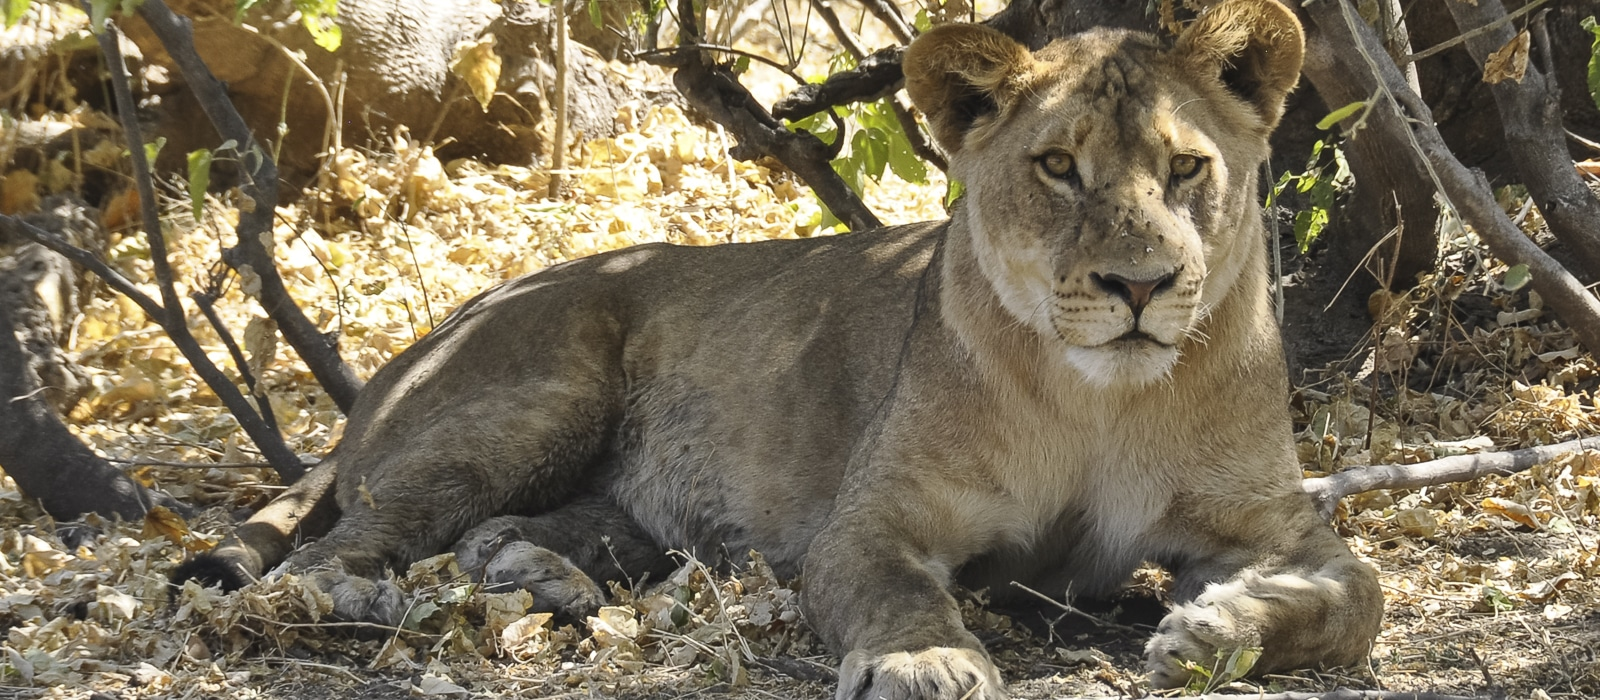 Lionne, Etosha, Himba, Namibie - les Routes du Monde